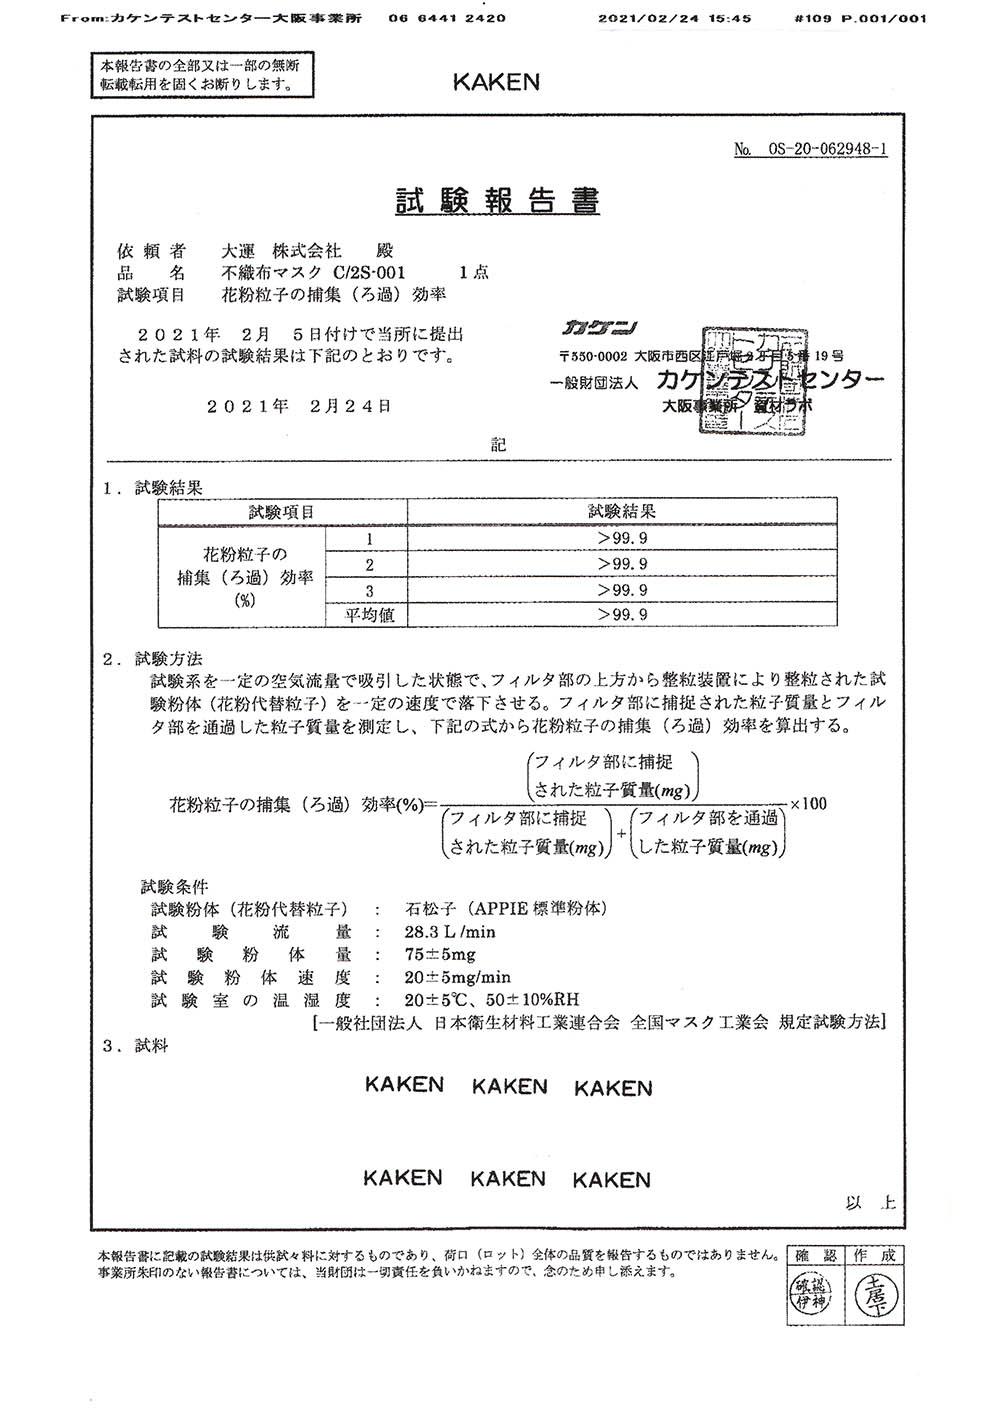 【B】 【6箱セット】世界標準の高品質マスク 三層不織布マスク ソフト平ゴム 1箱50枚入 大人用